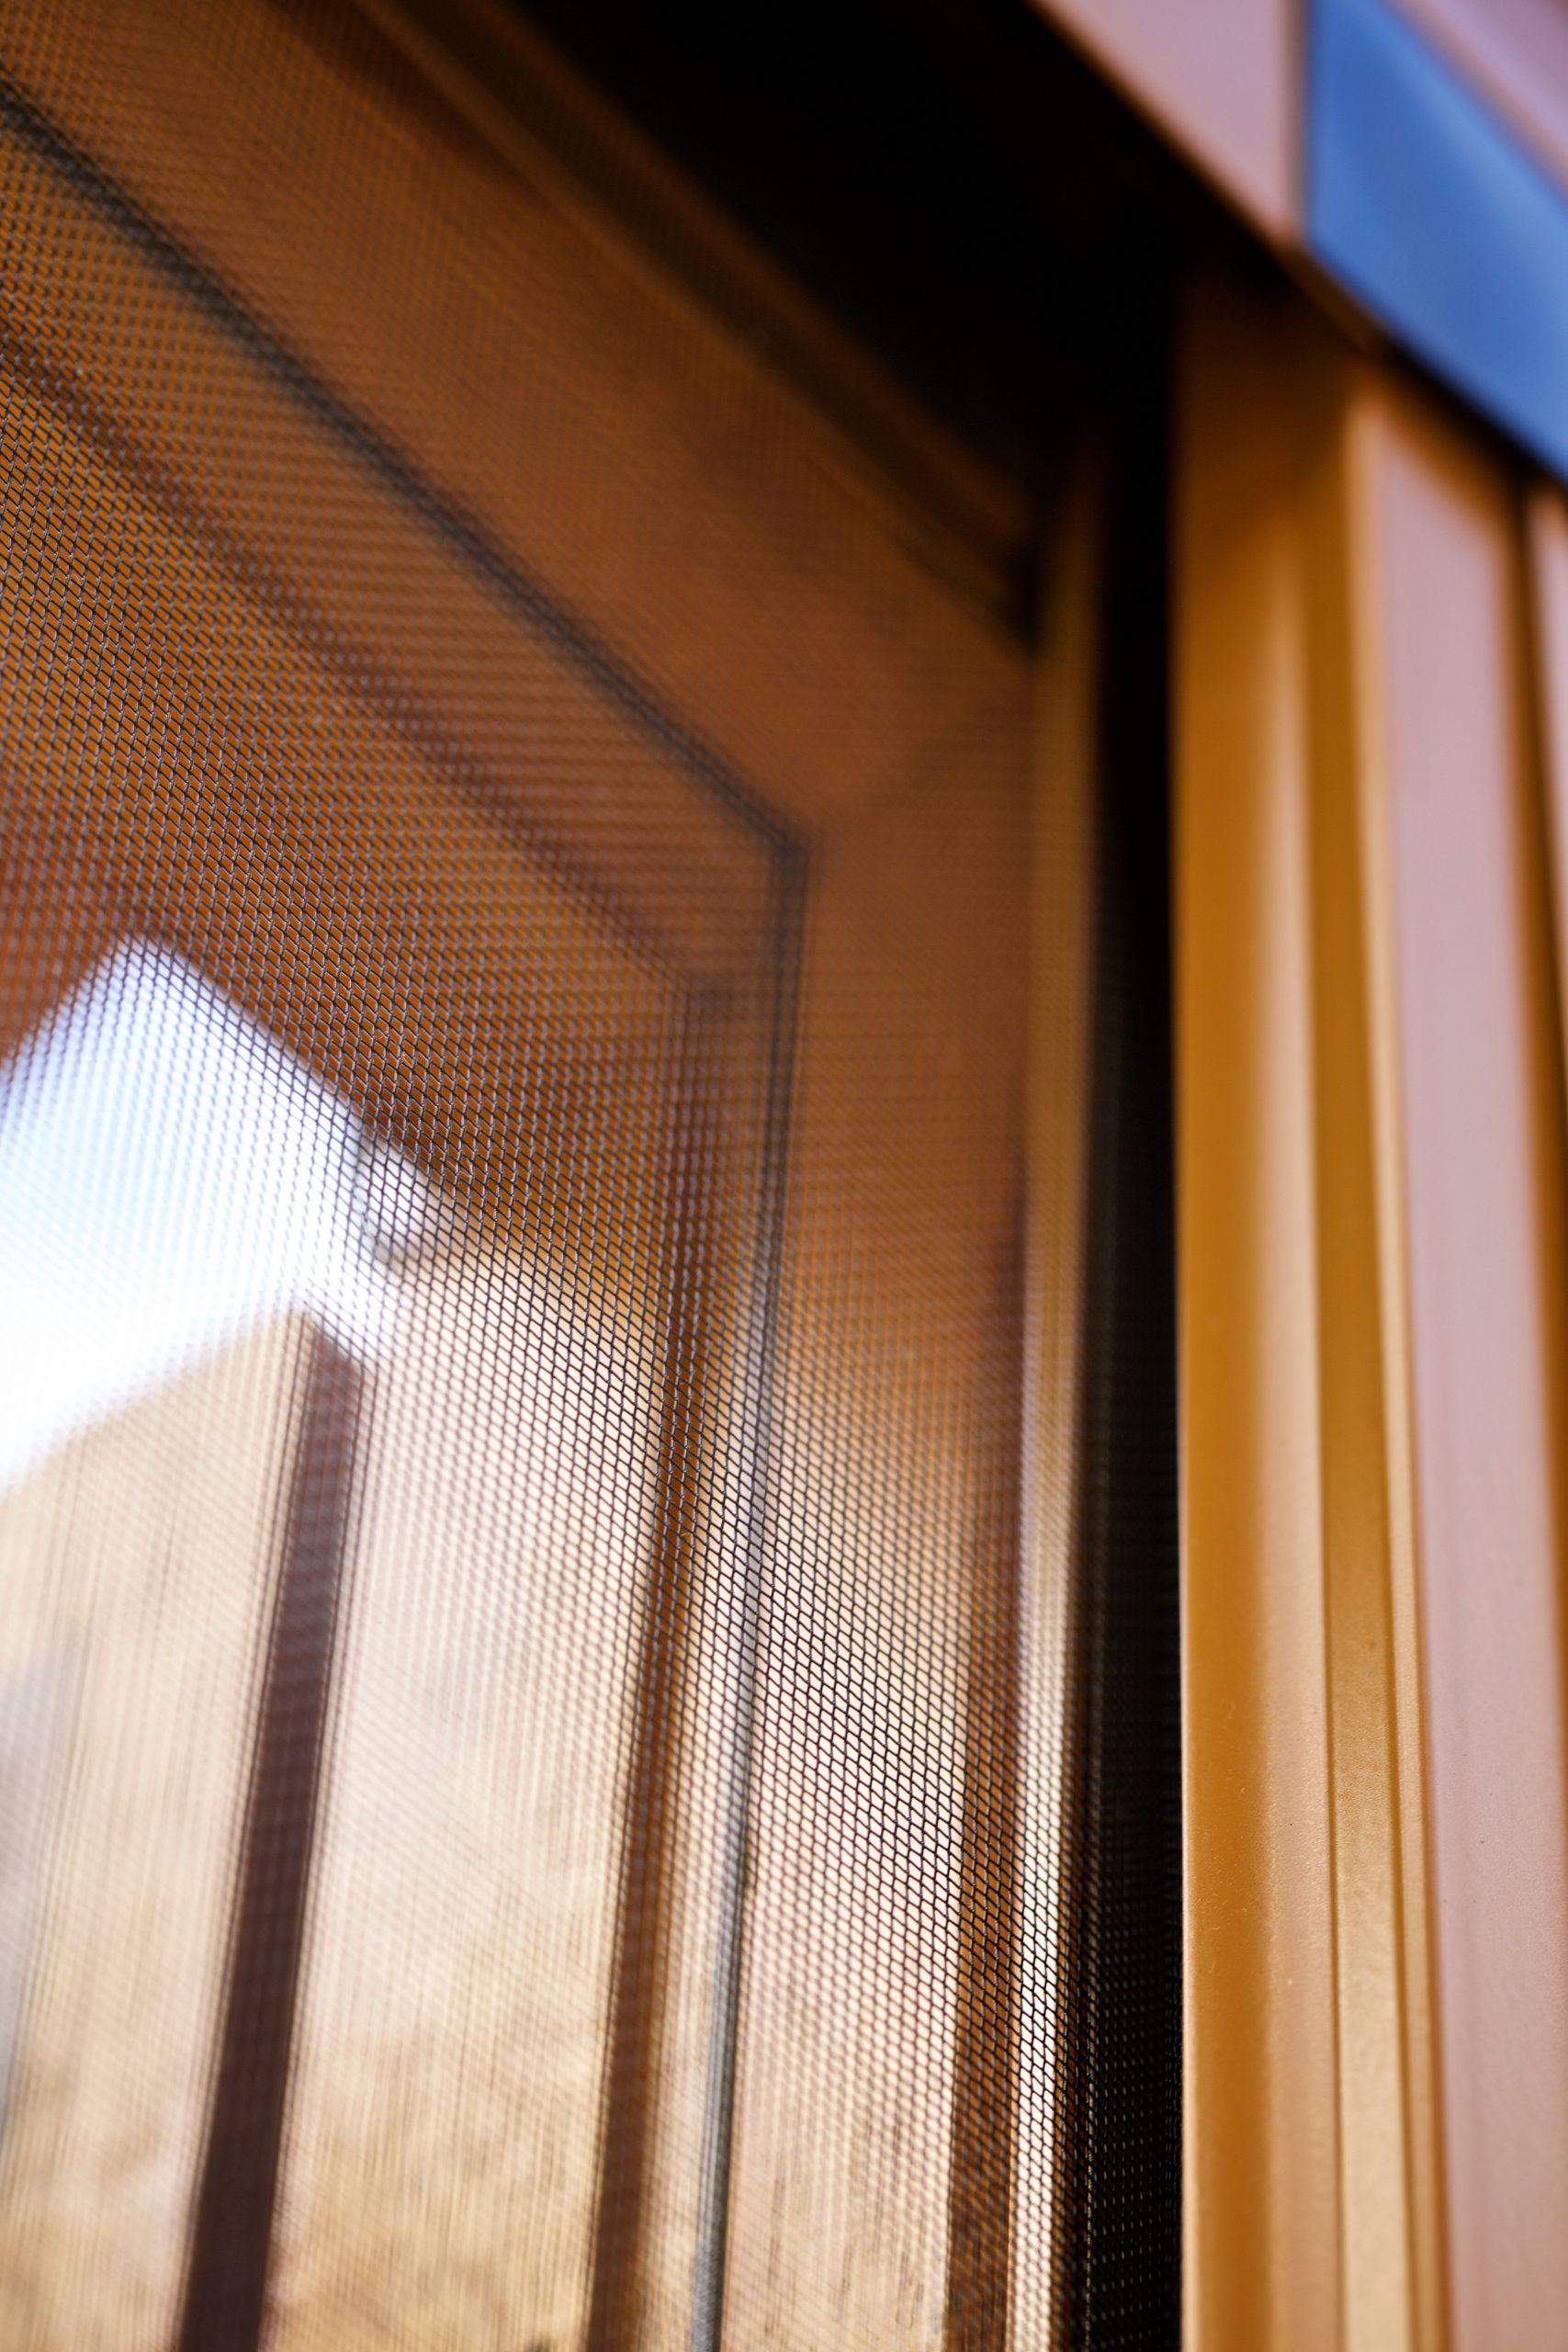 Window fly screens UK